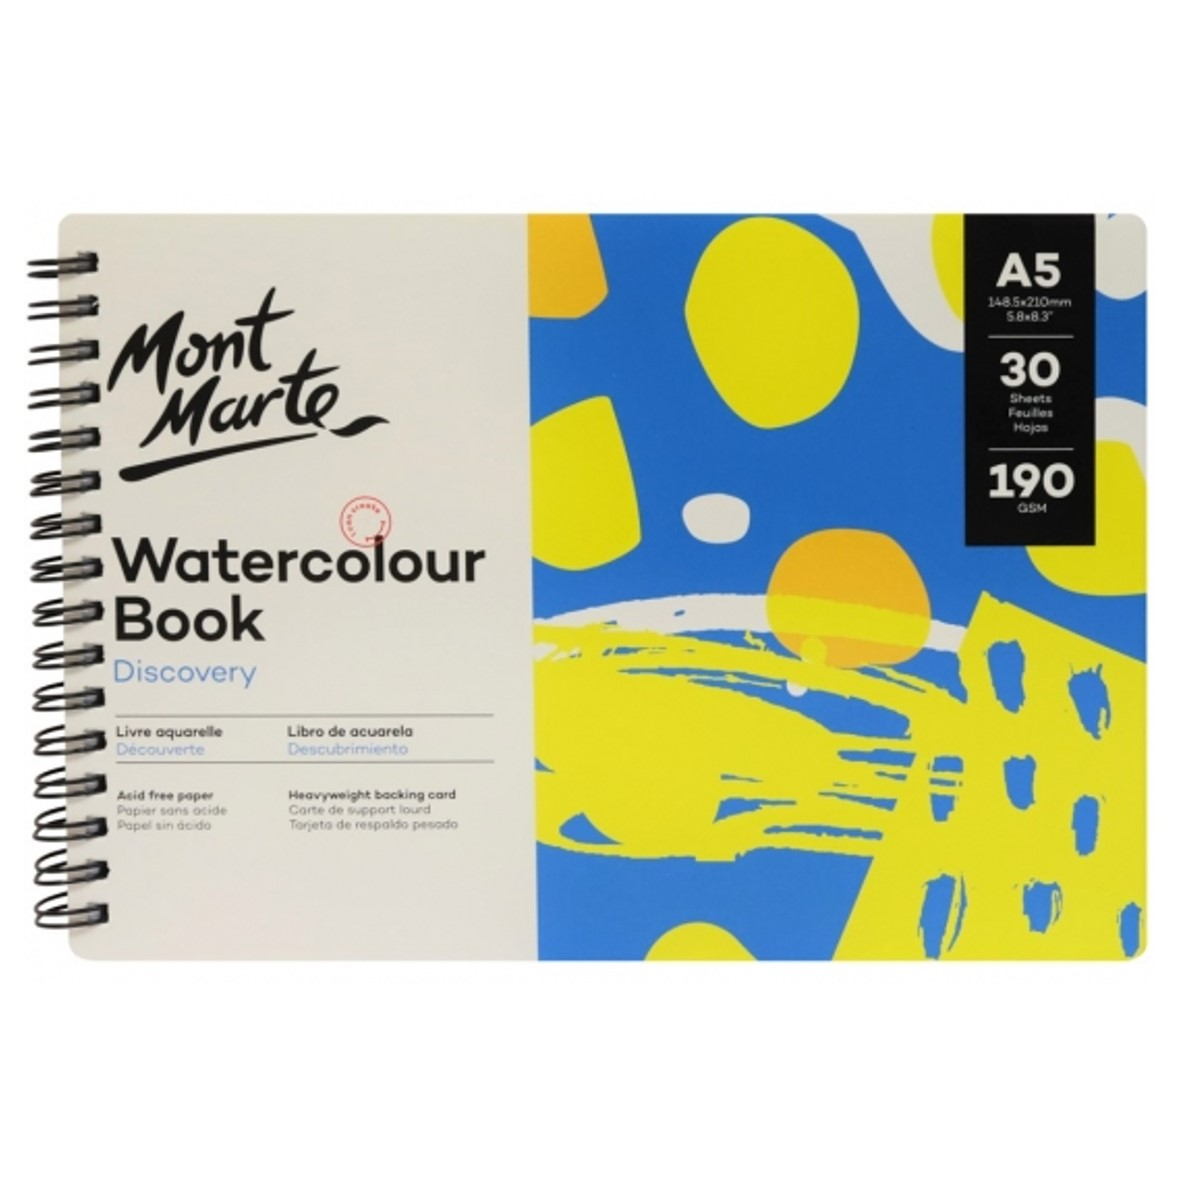 Watercolour A5 Book